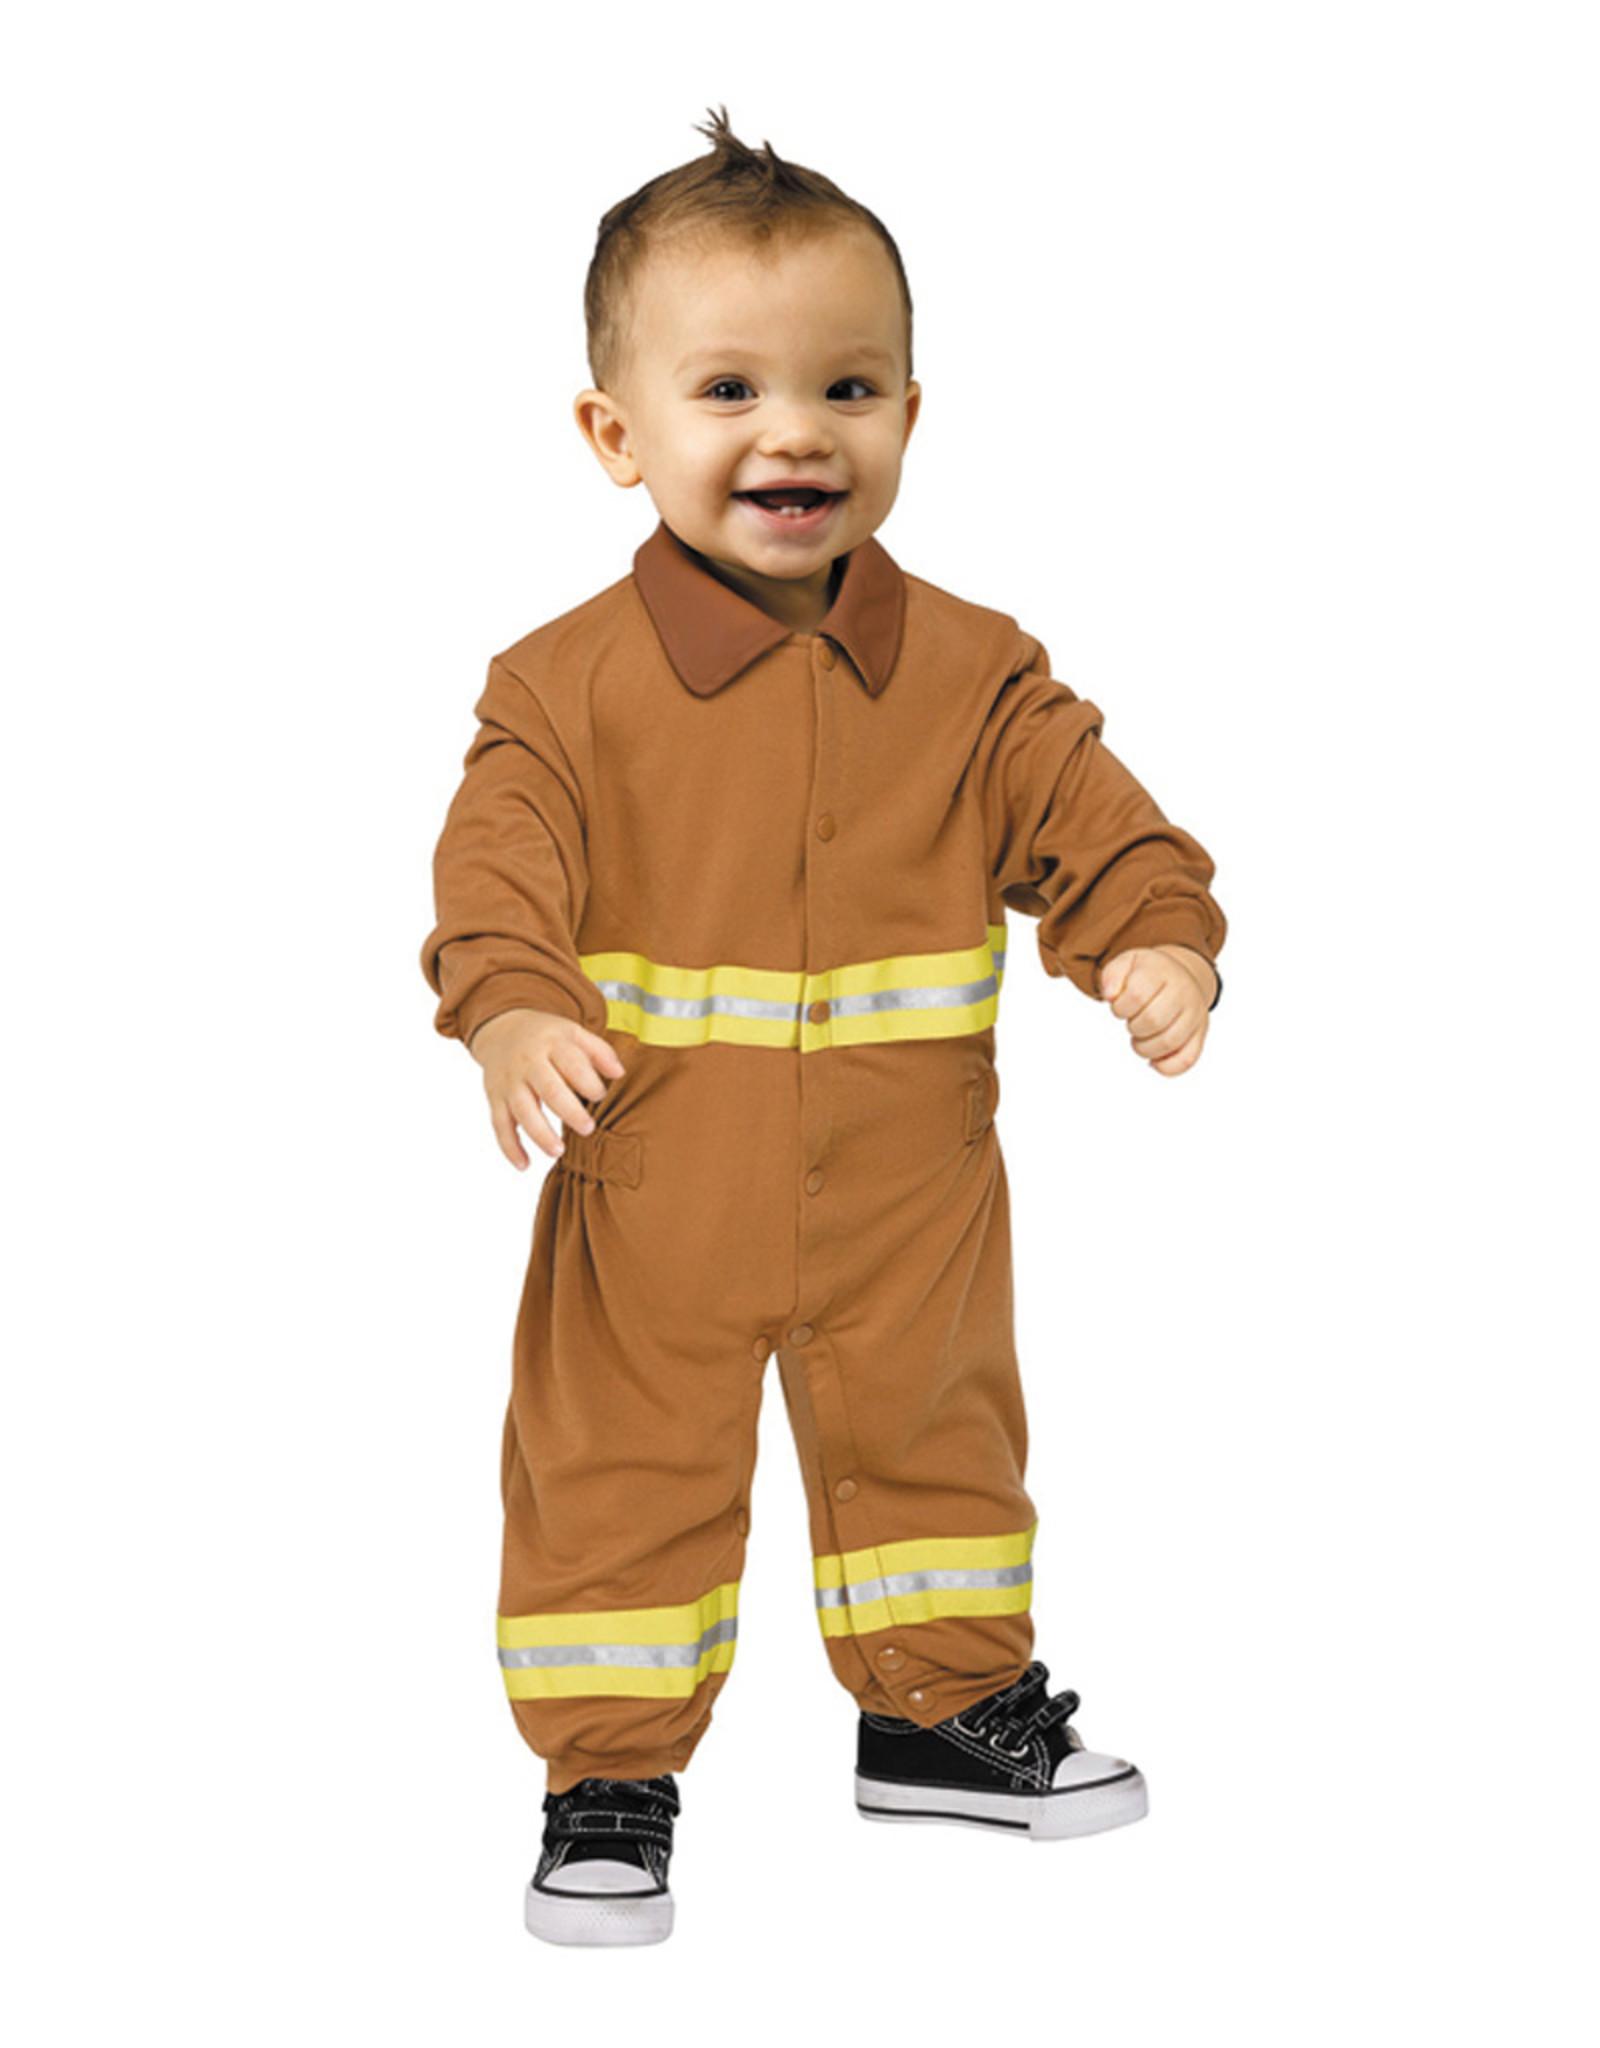 Fireman Costume - Infant